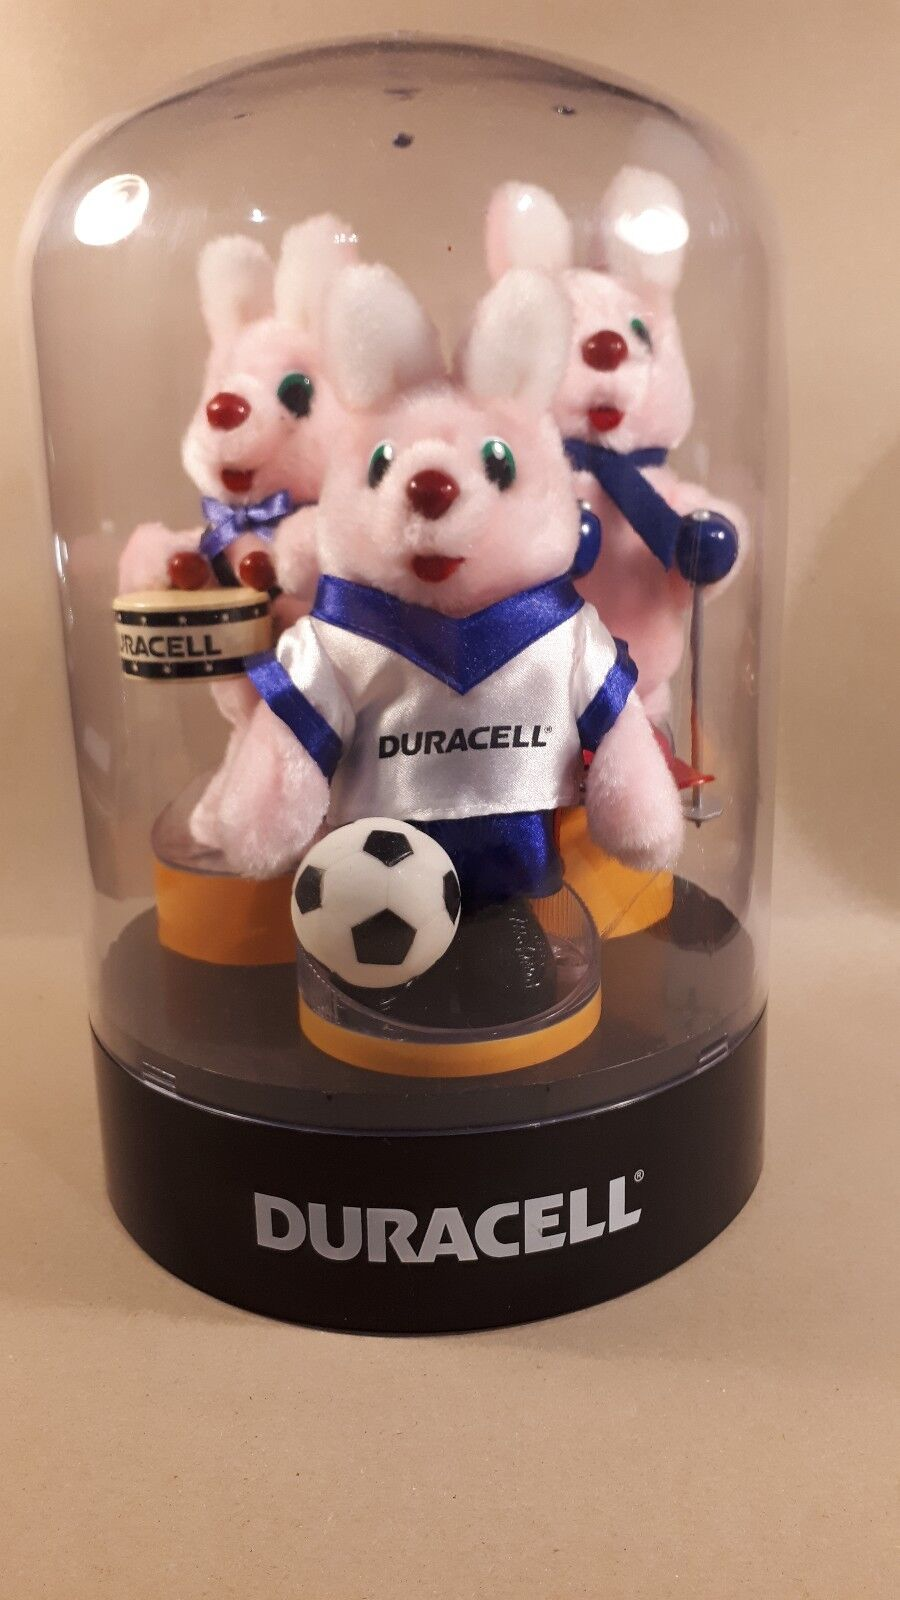 Duracell Bunny shop display adgreenising 1990s